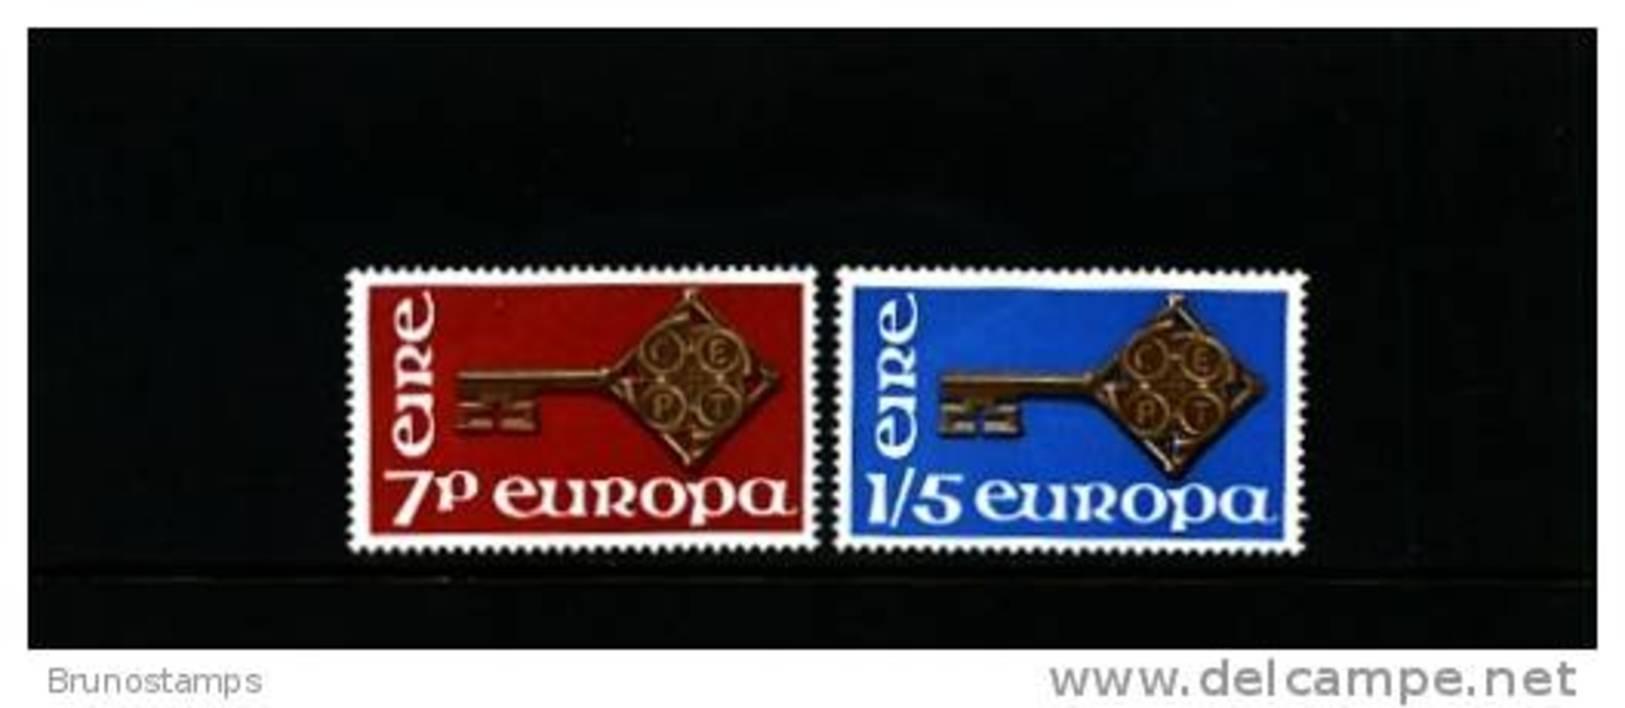 IRELAND/EIRE - 1968  EUROPA  SET MINT NH - 1949-... Repubblica D'Irlanda